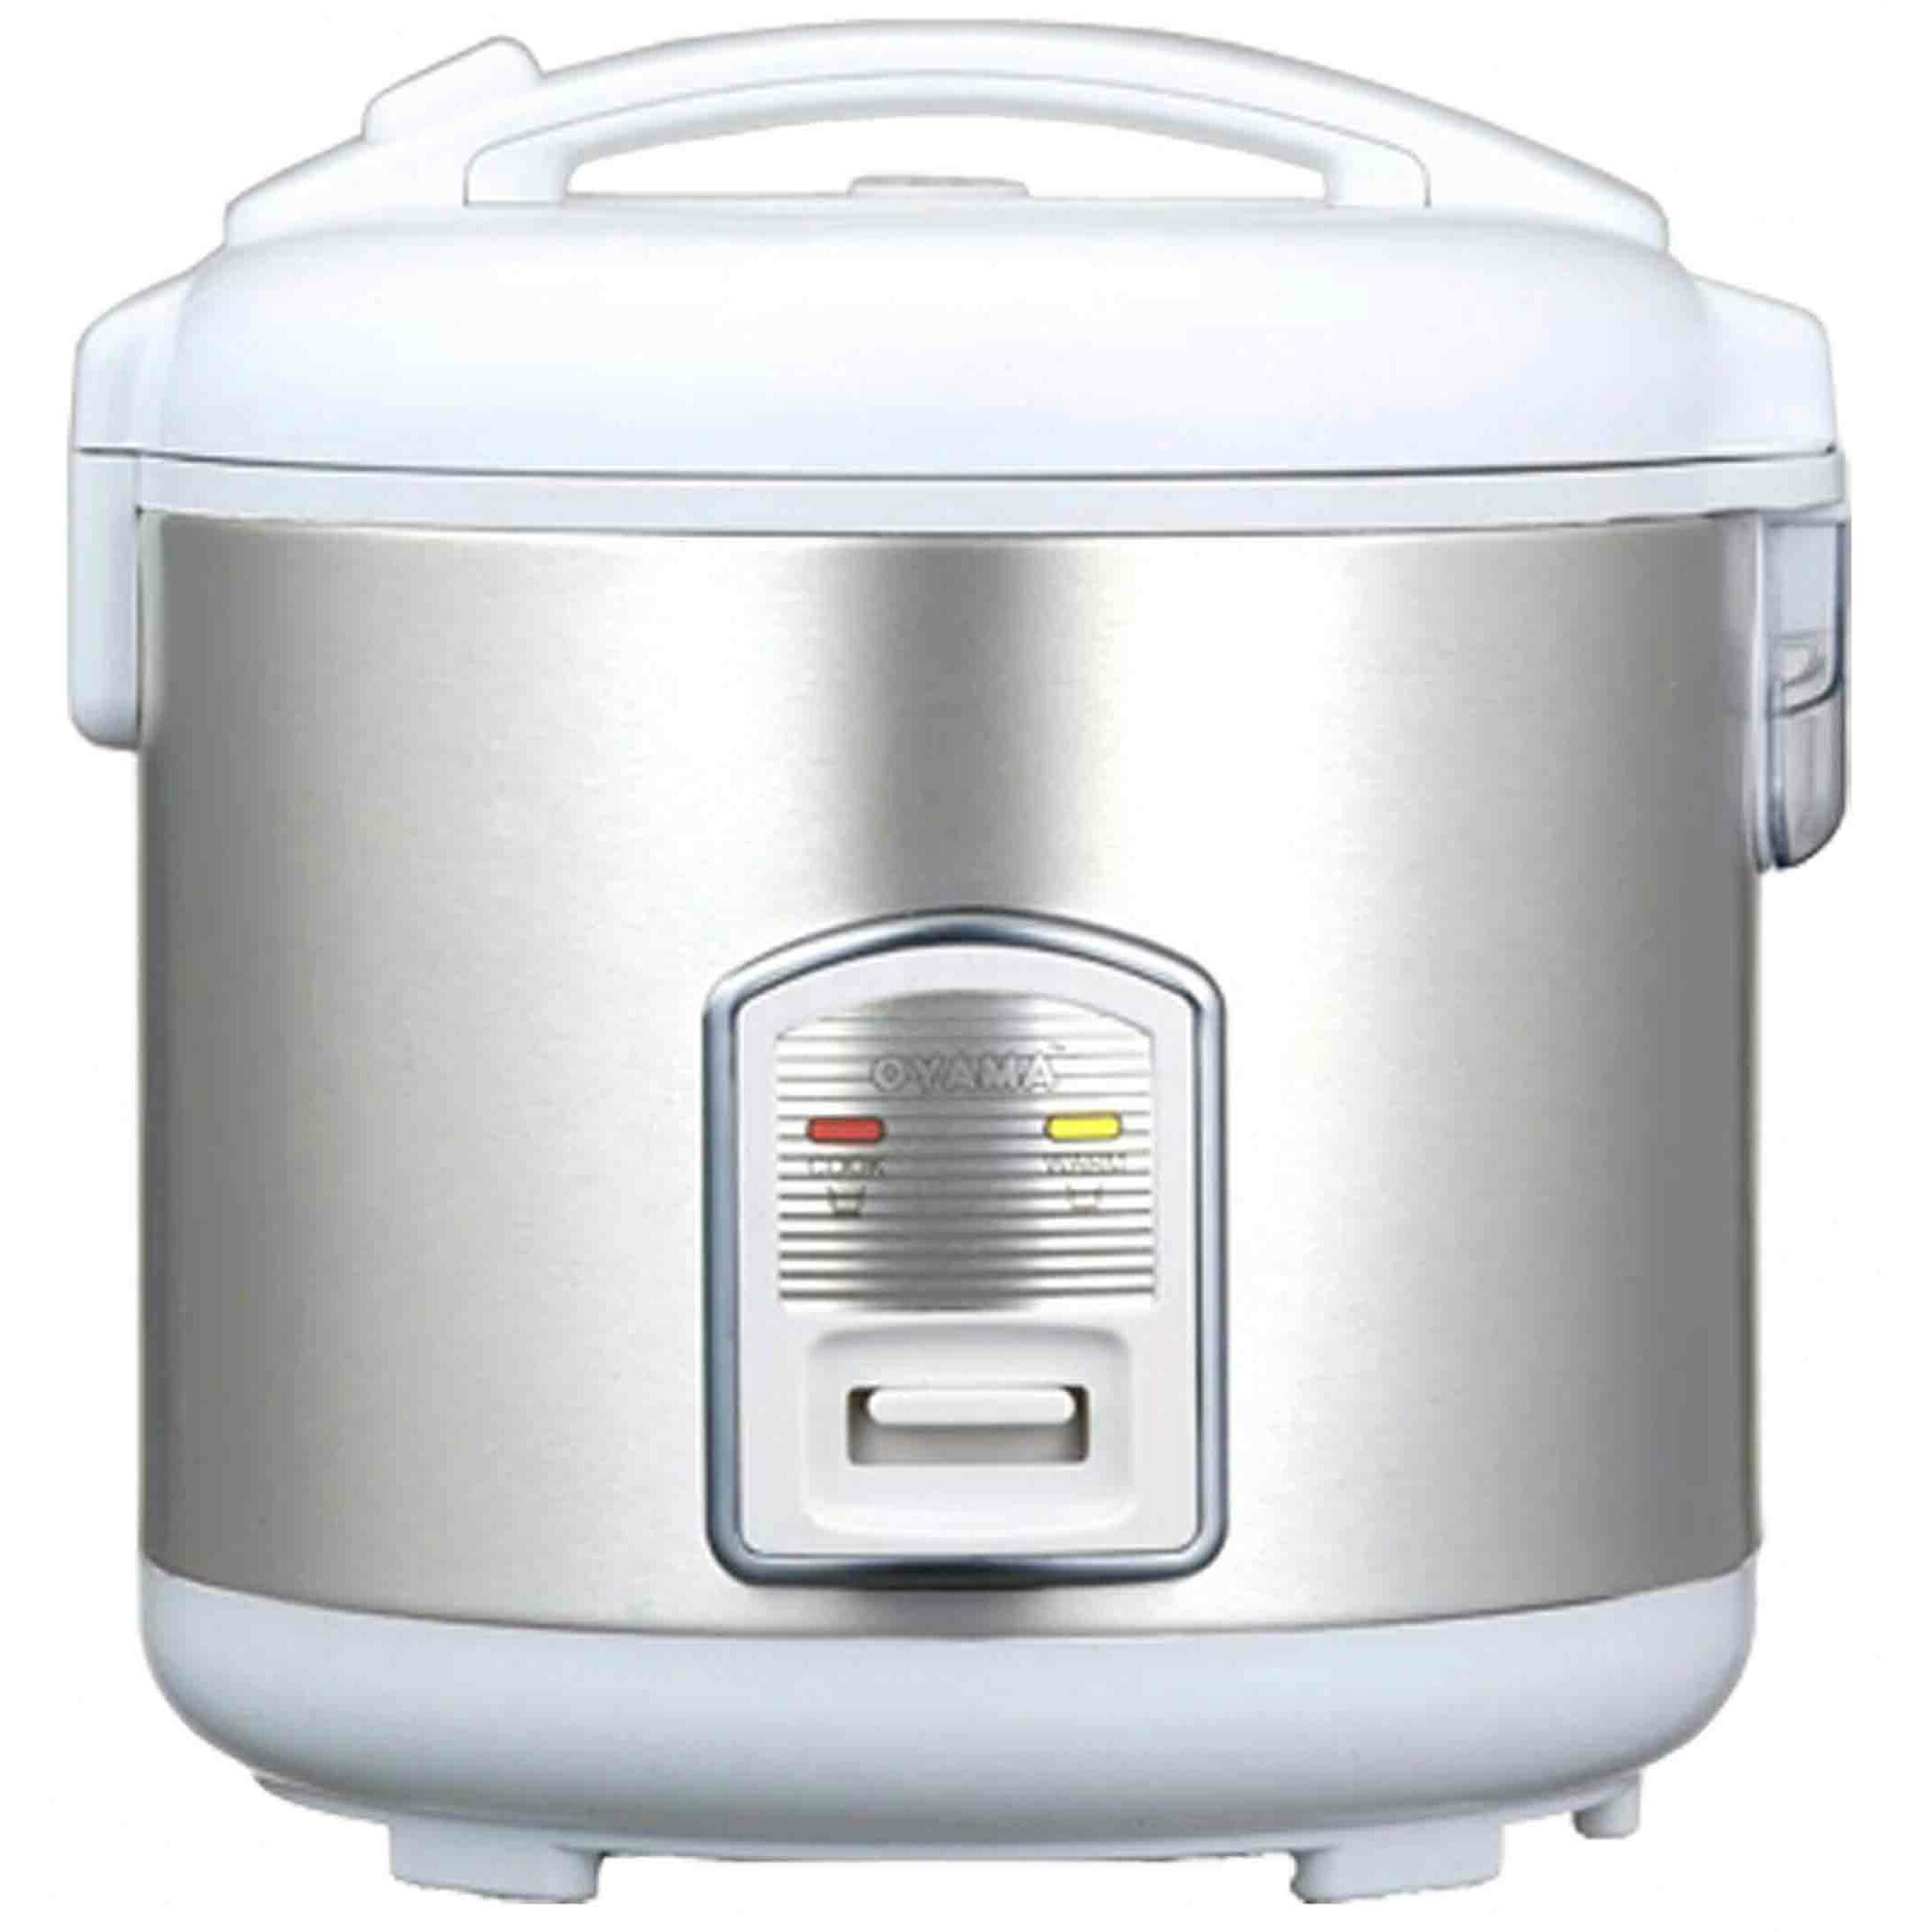 Oyama Rice Cooker, Warmer and Steamer & Reviews | Wayfair